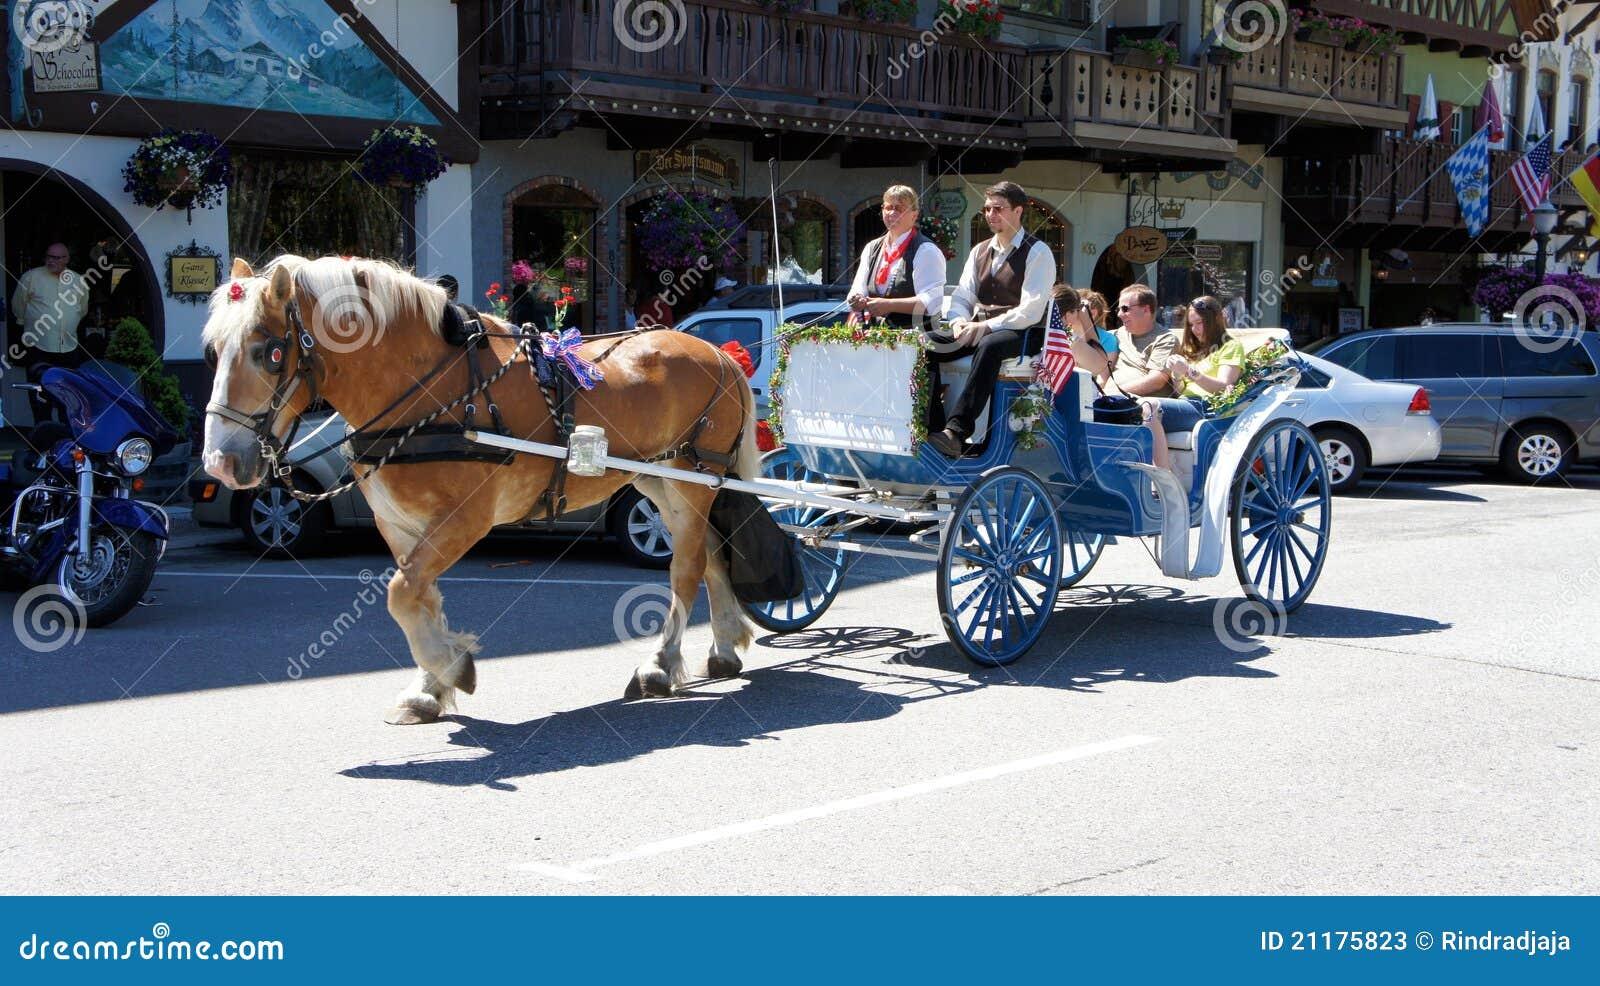 Horse cart in Leavenworth, Washington